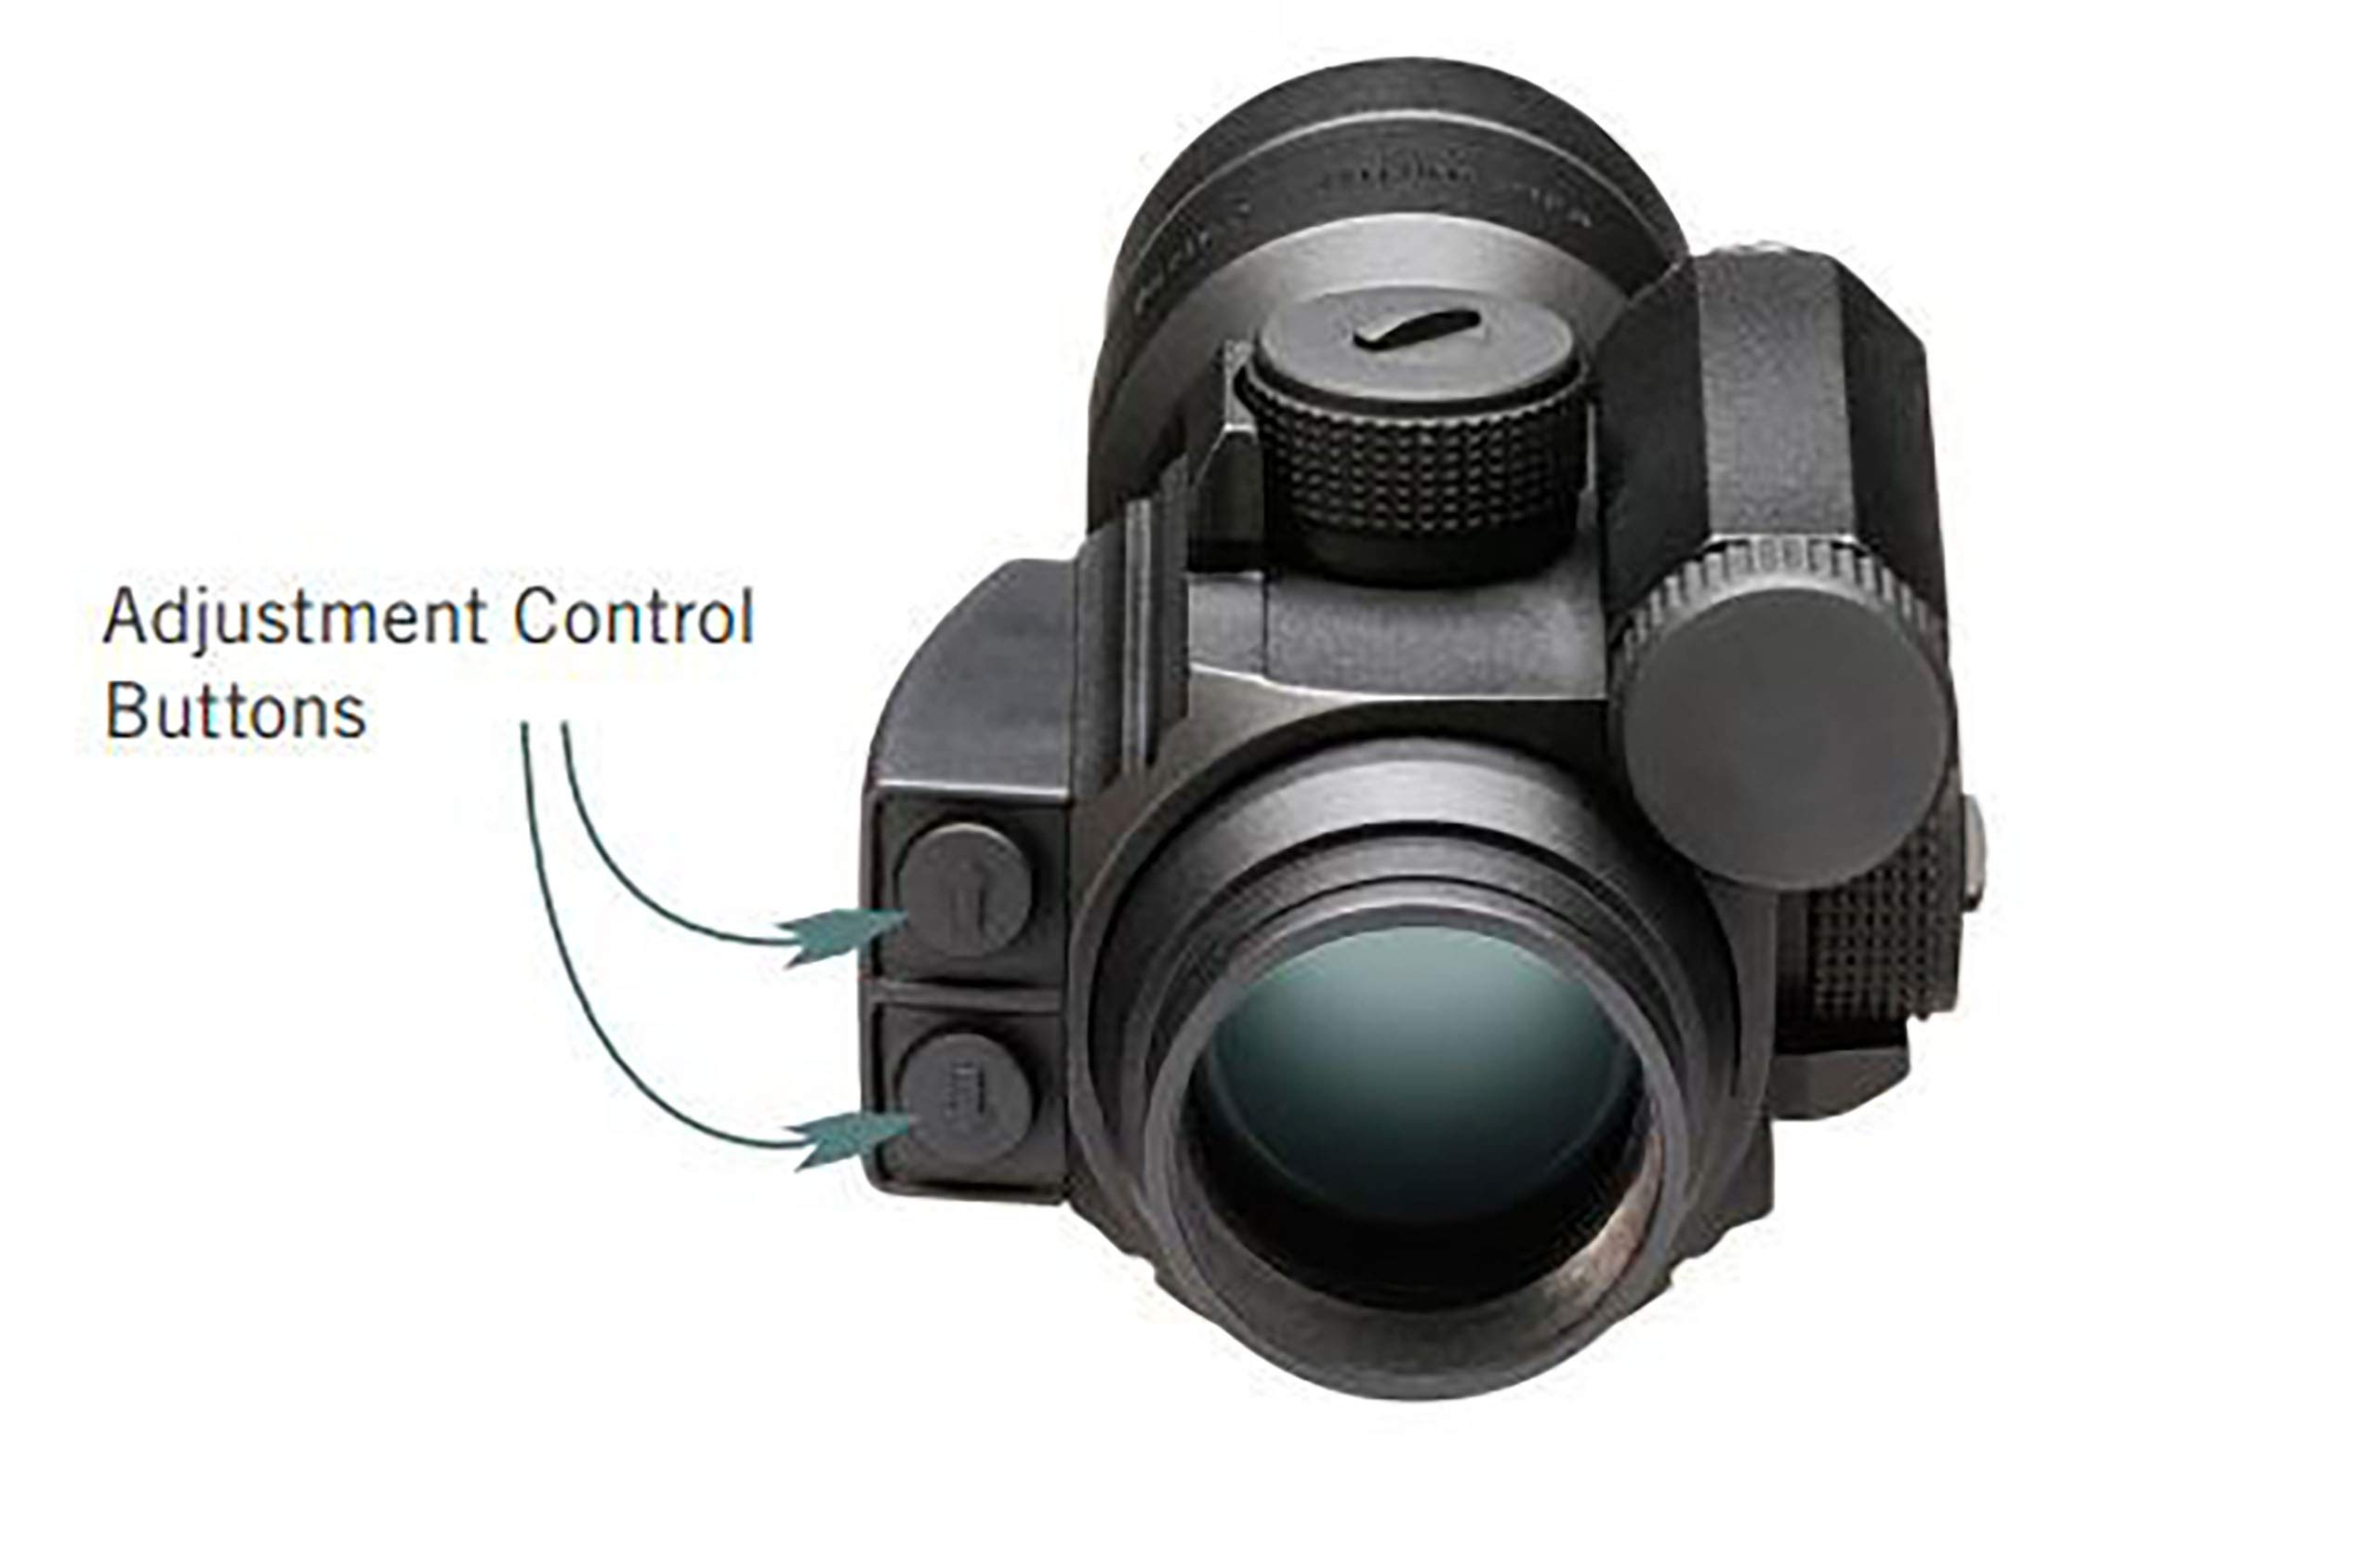 Vortex Optics Strikefire II Red Dot Sight - 4 MOA Red/Green Dot with Vortex Hat by Vortex Optics (Image #6)